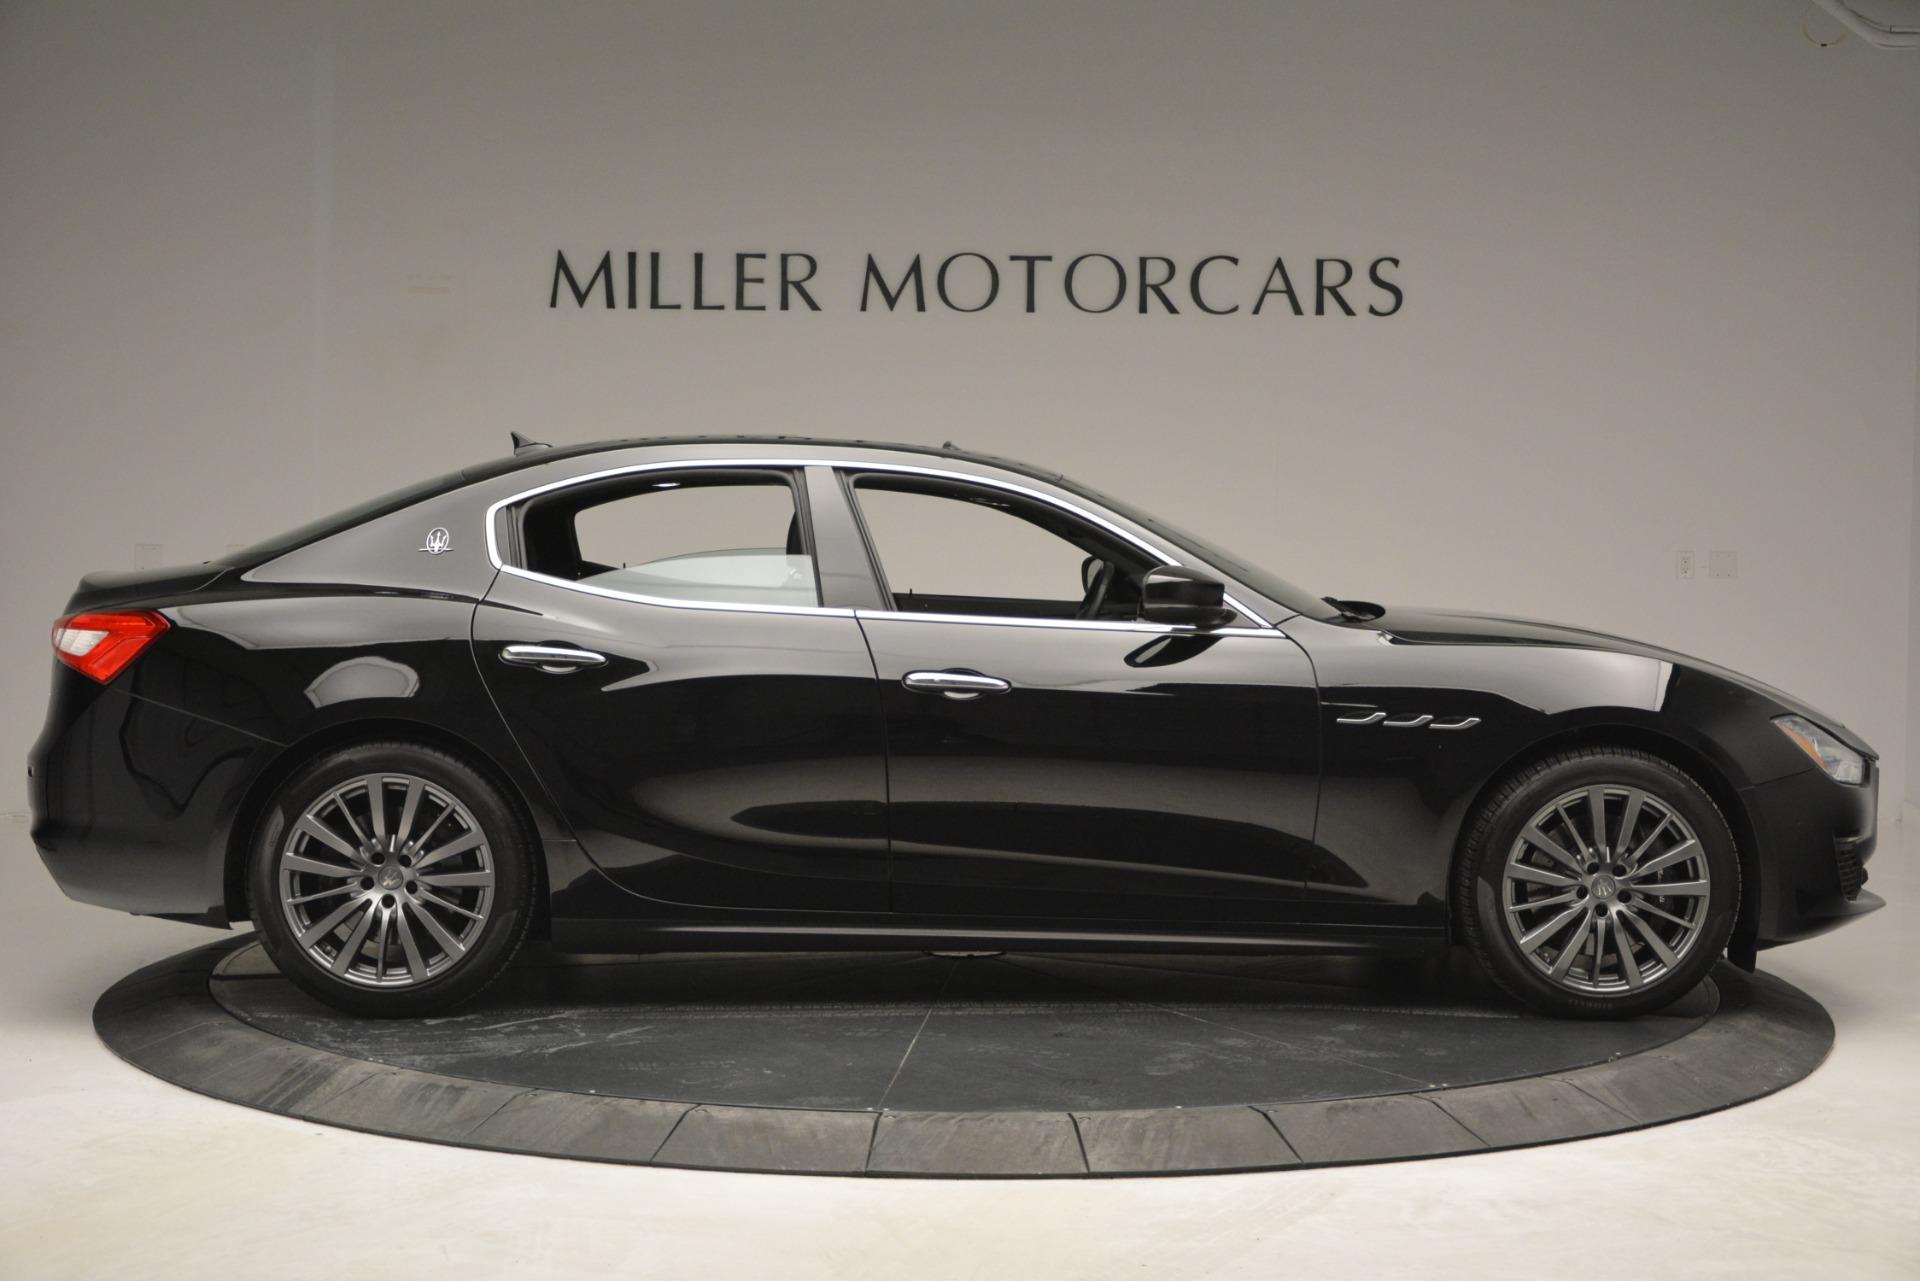 Used 2018 Maserati Ghibli S Q4 For Sale In Greenwich, CT 2944_p12